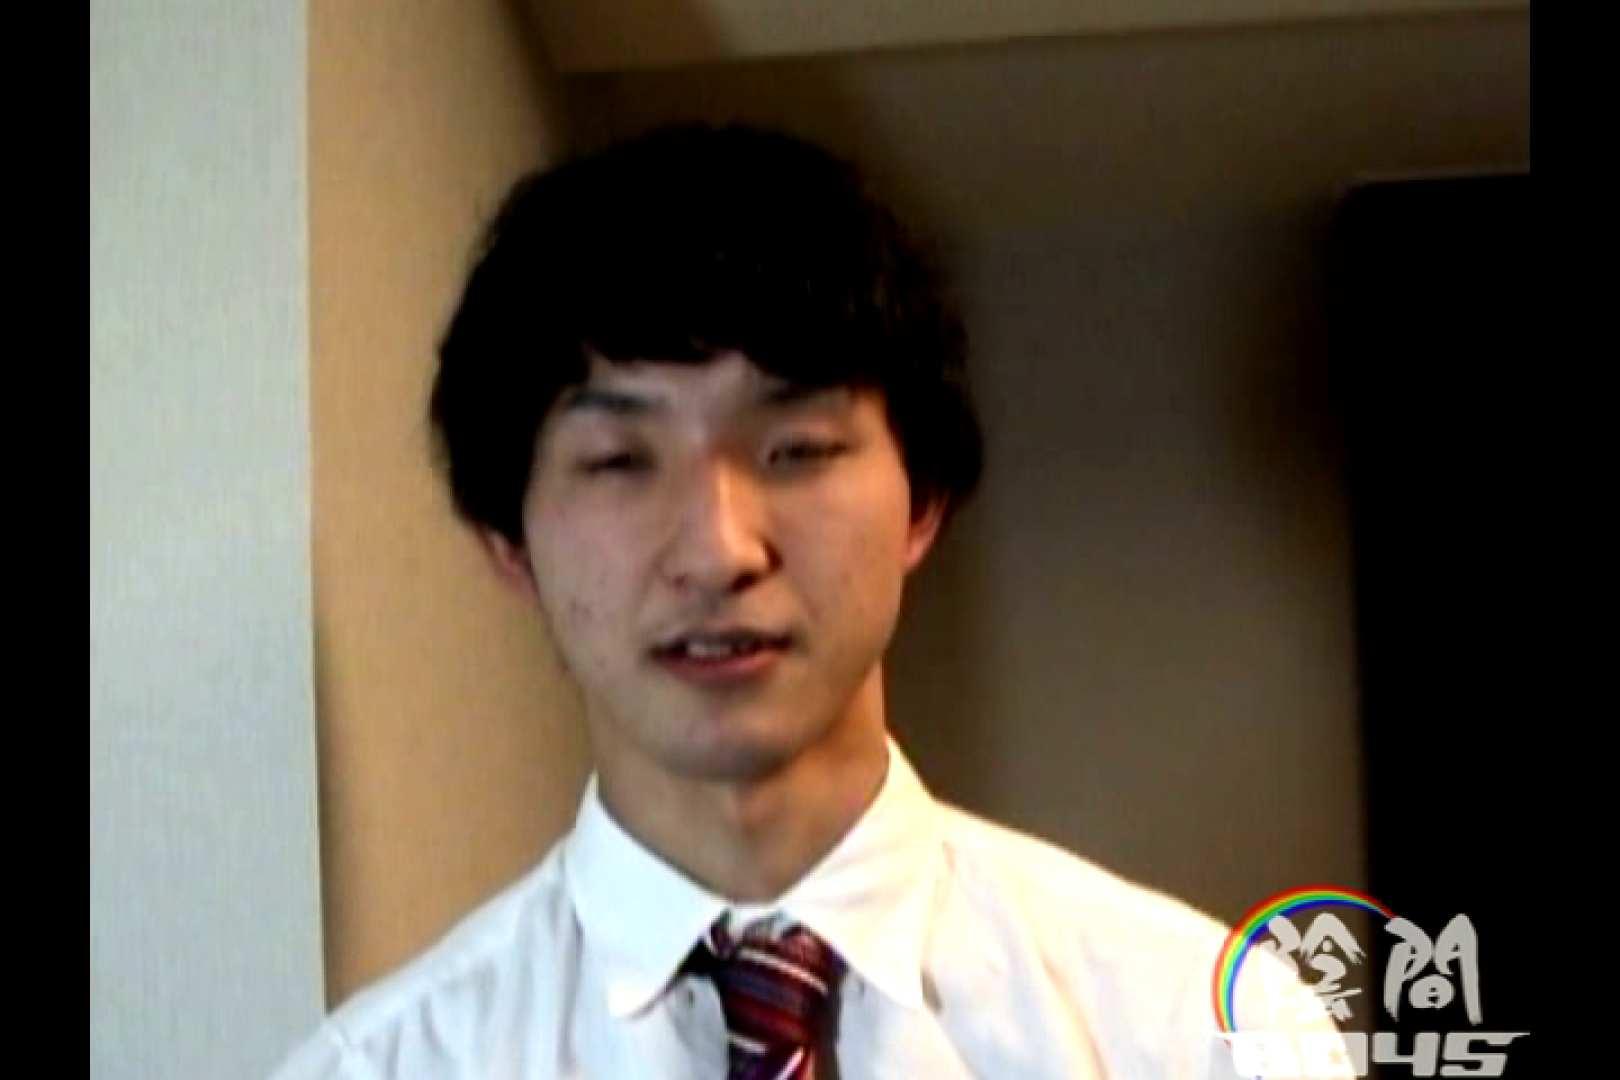 陰間BOYS~power harassment~03 悪戯特集 男同士動画 90枚 29